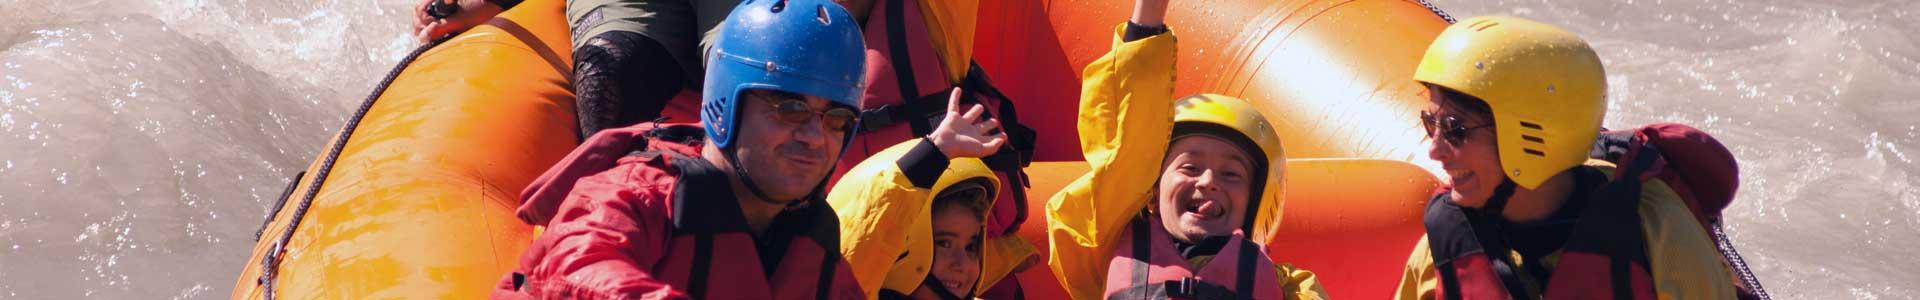 discesa rafting family